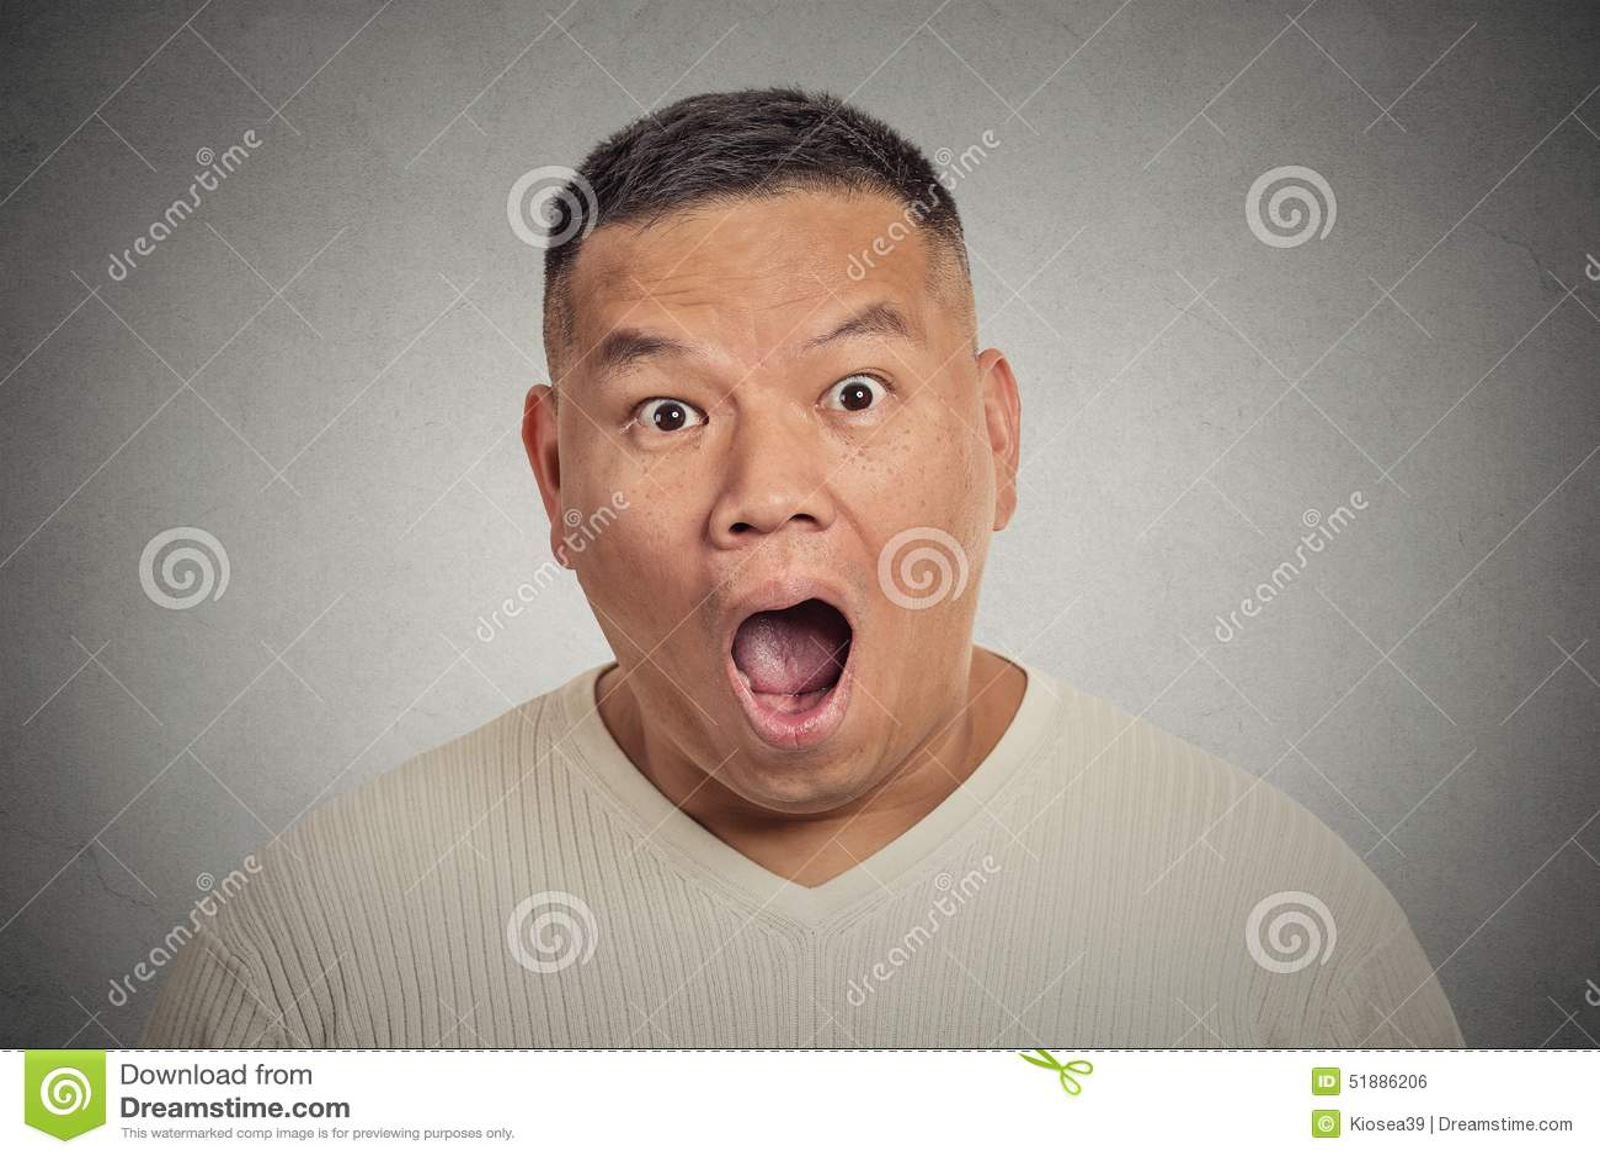 Hombre sorprendido chocado Headshot aislado en fondo gris